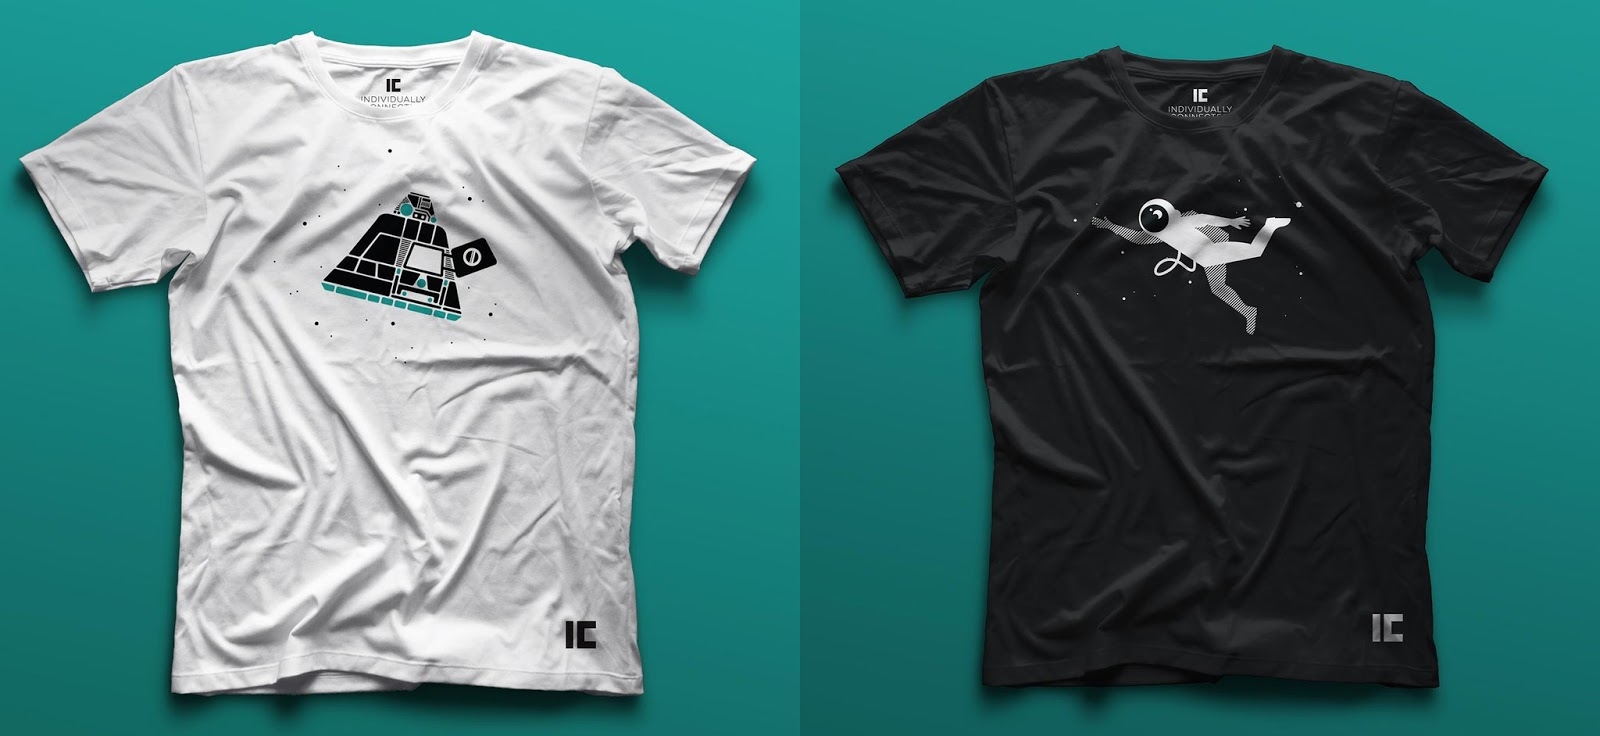 https://www.fanisetas.com/camiseta-pokebump-go-p-7298.html